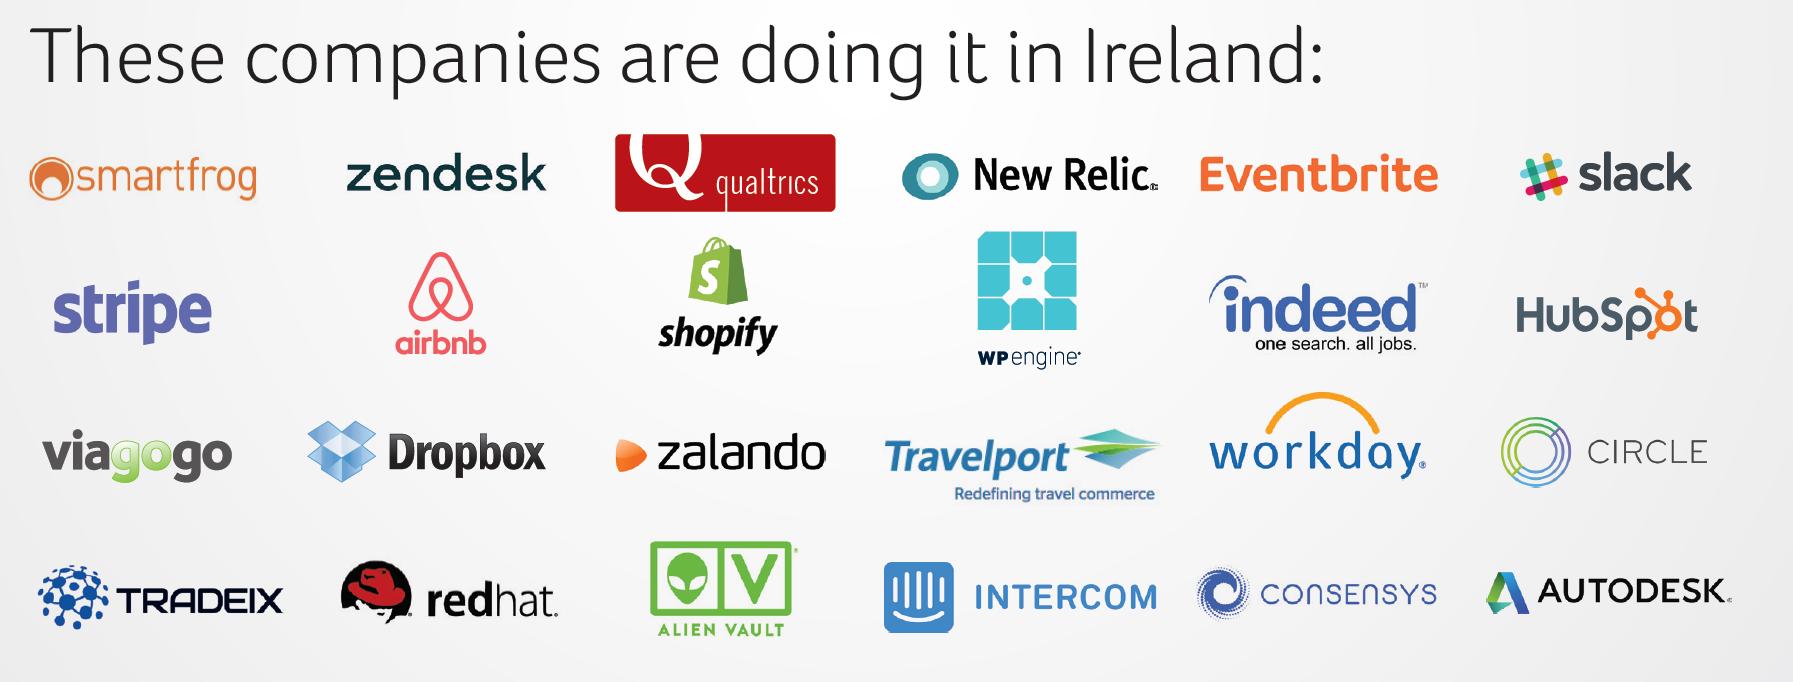 companies doing it in Ireland